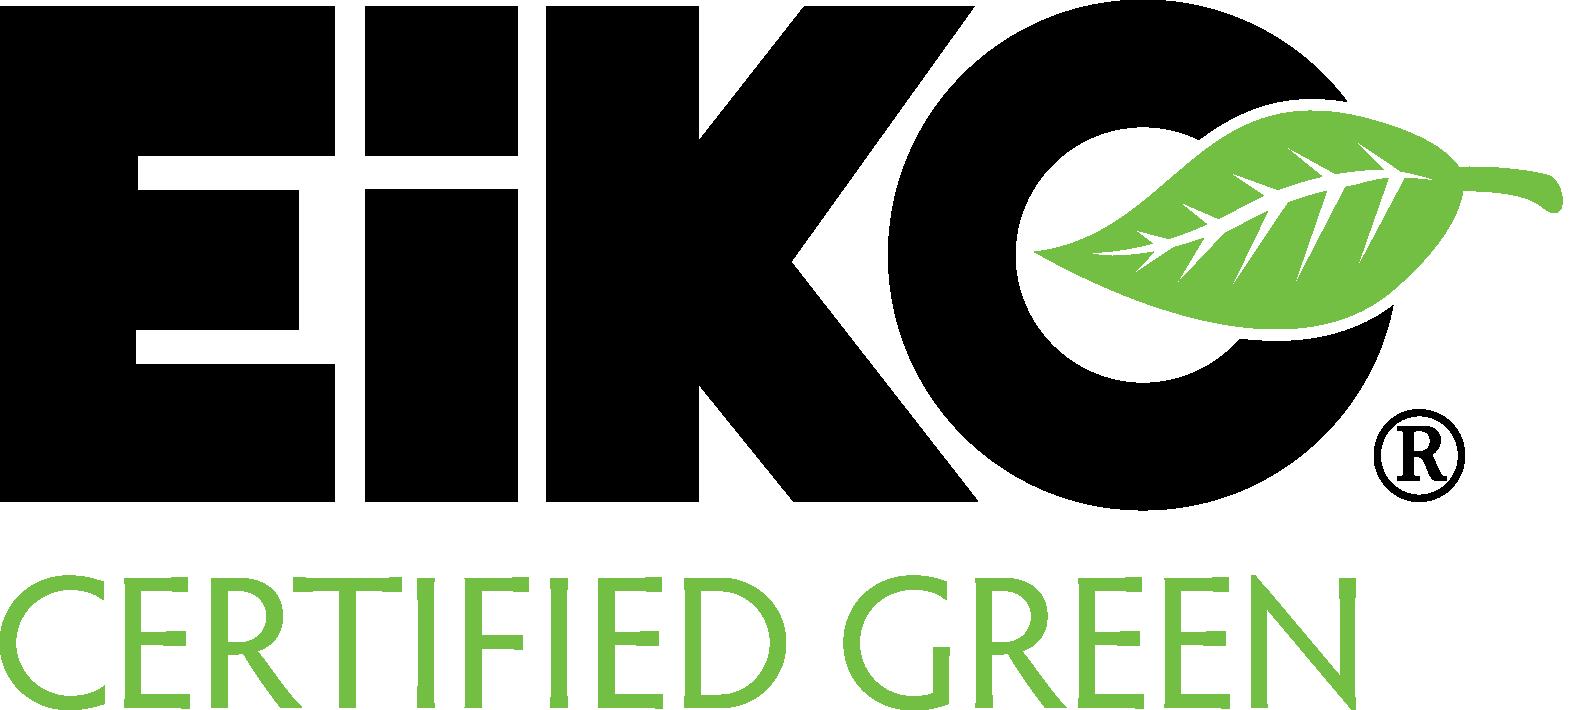 EiKO-Cert-Green-CMYK-black-green